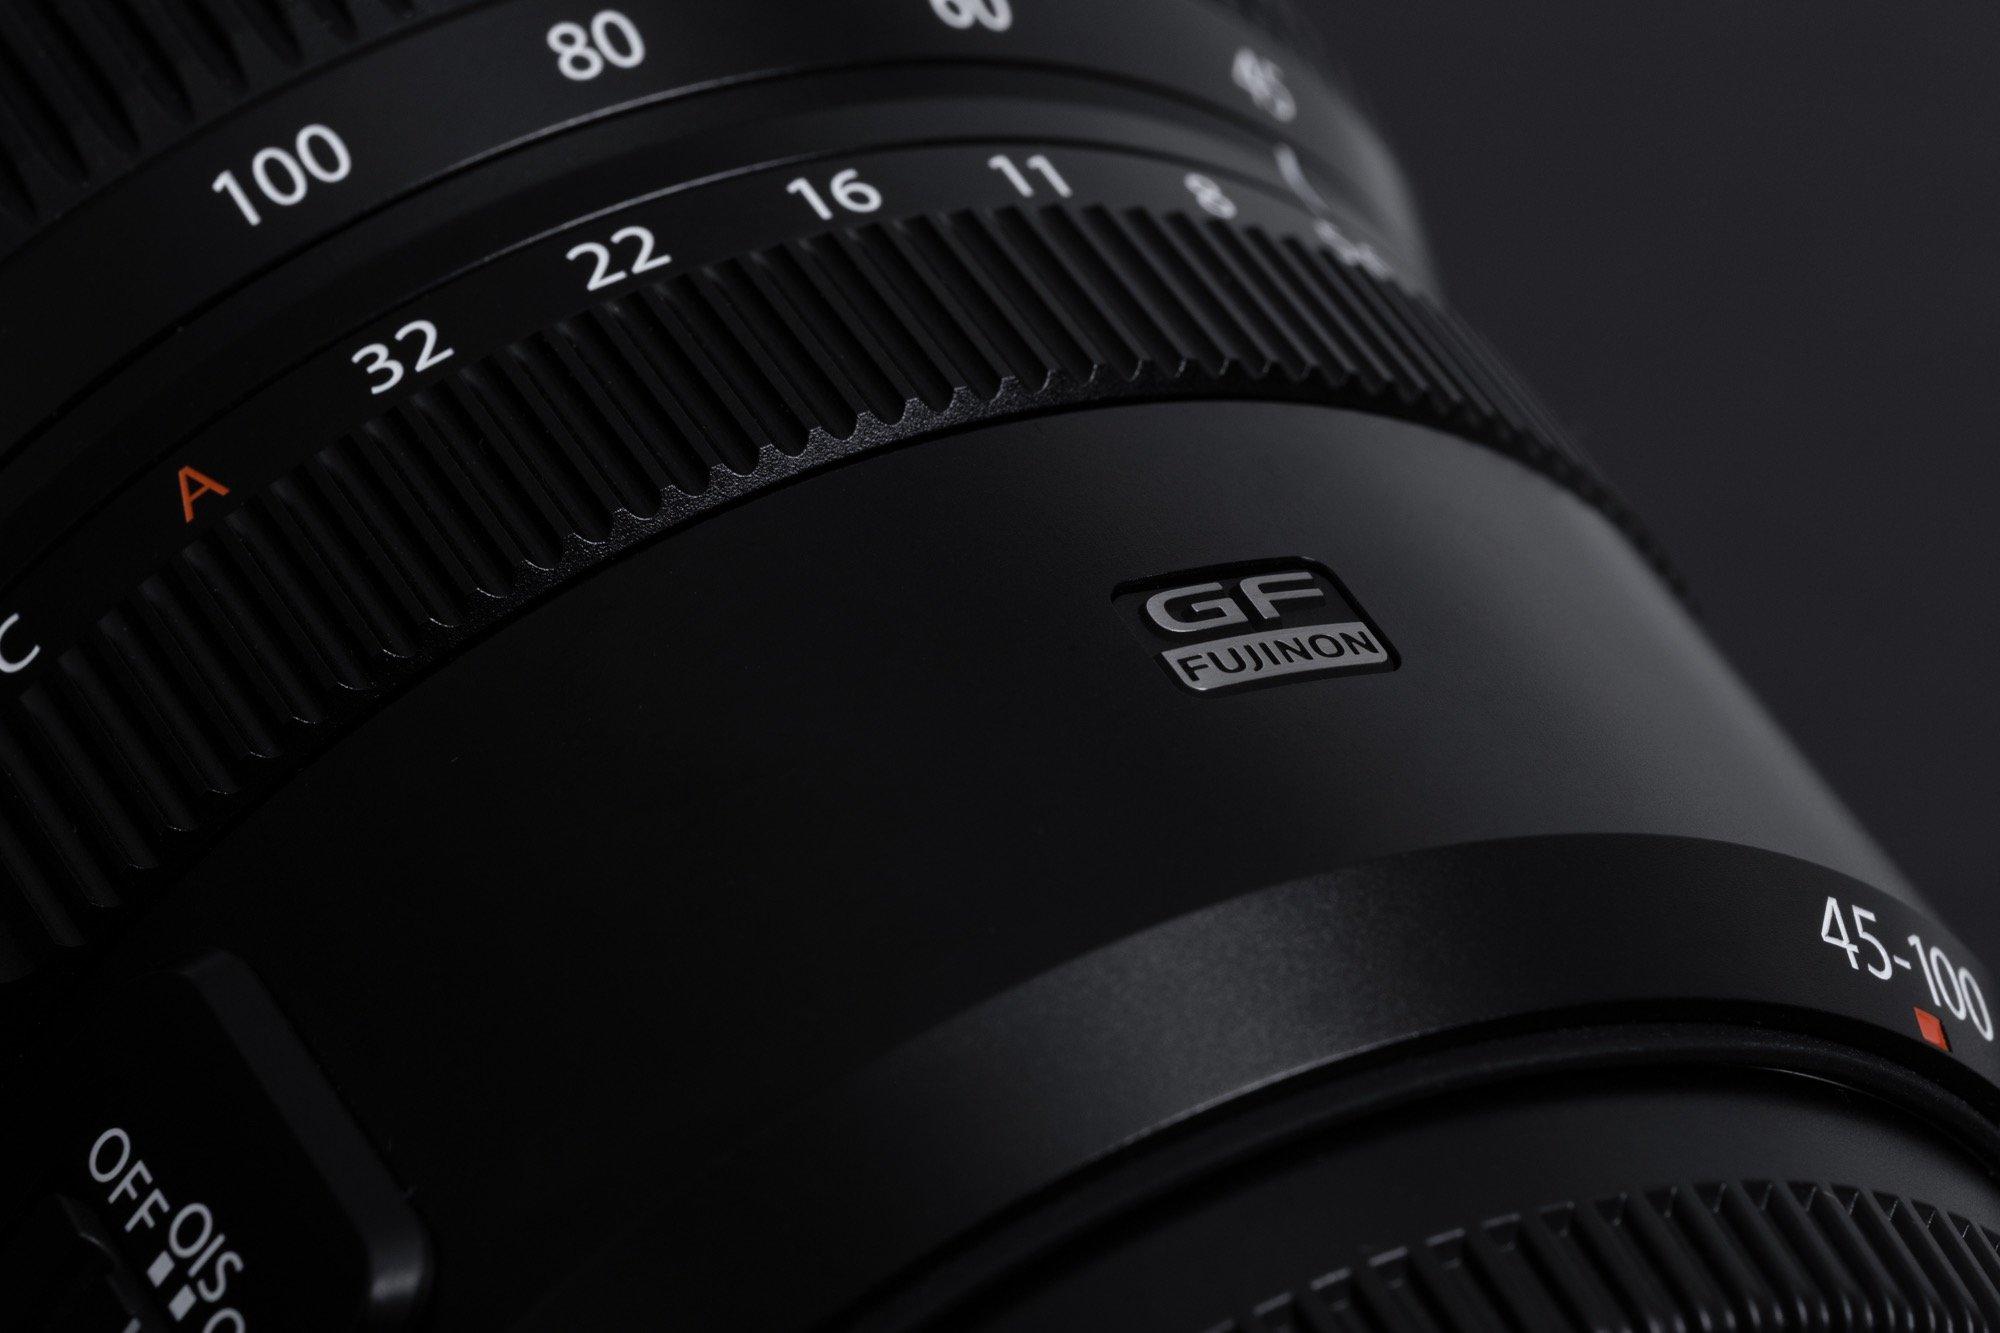 FUJIFILM GF 45-100mm lens Product Photography Singapore Jose Jeuland 2